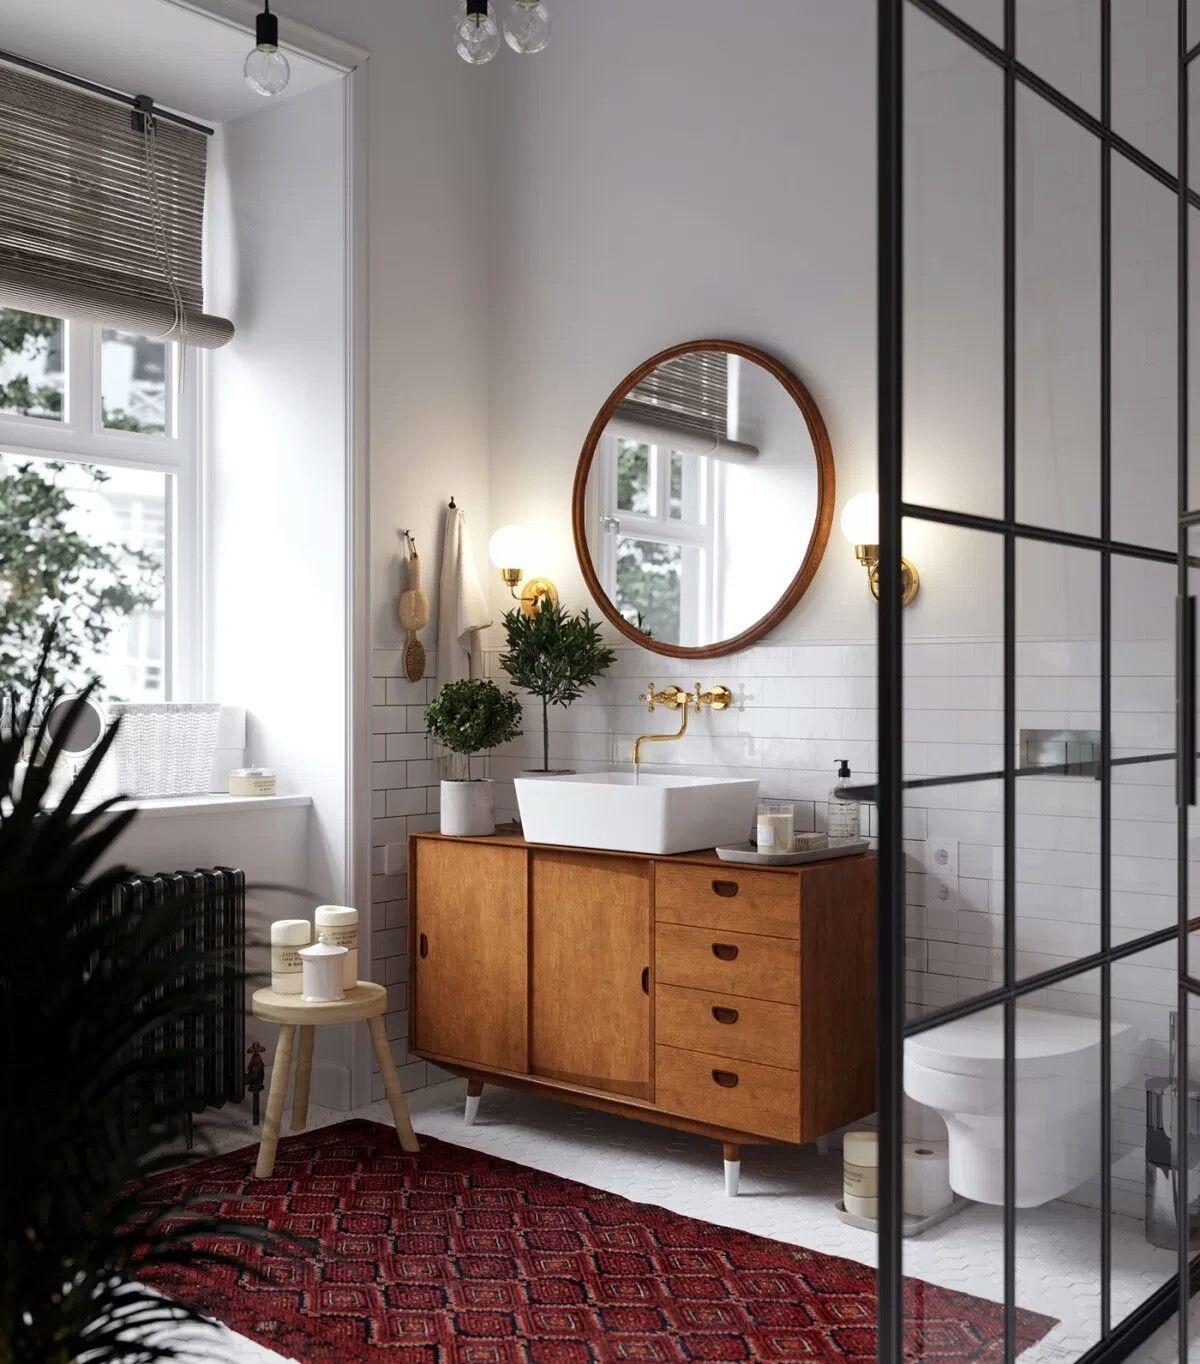 desain kamar mandi minimalis mewah ala hotel berbintang